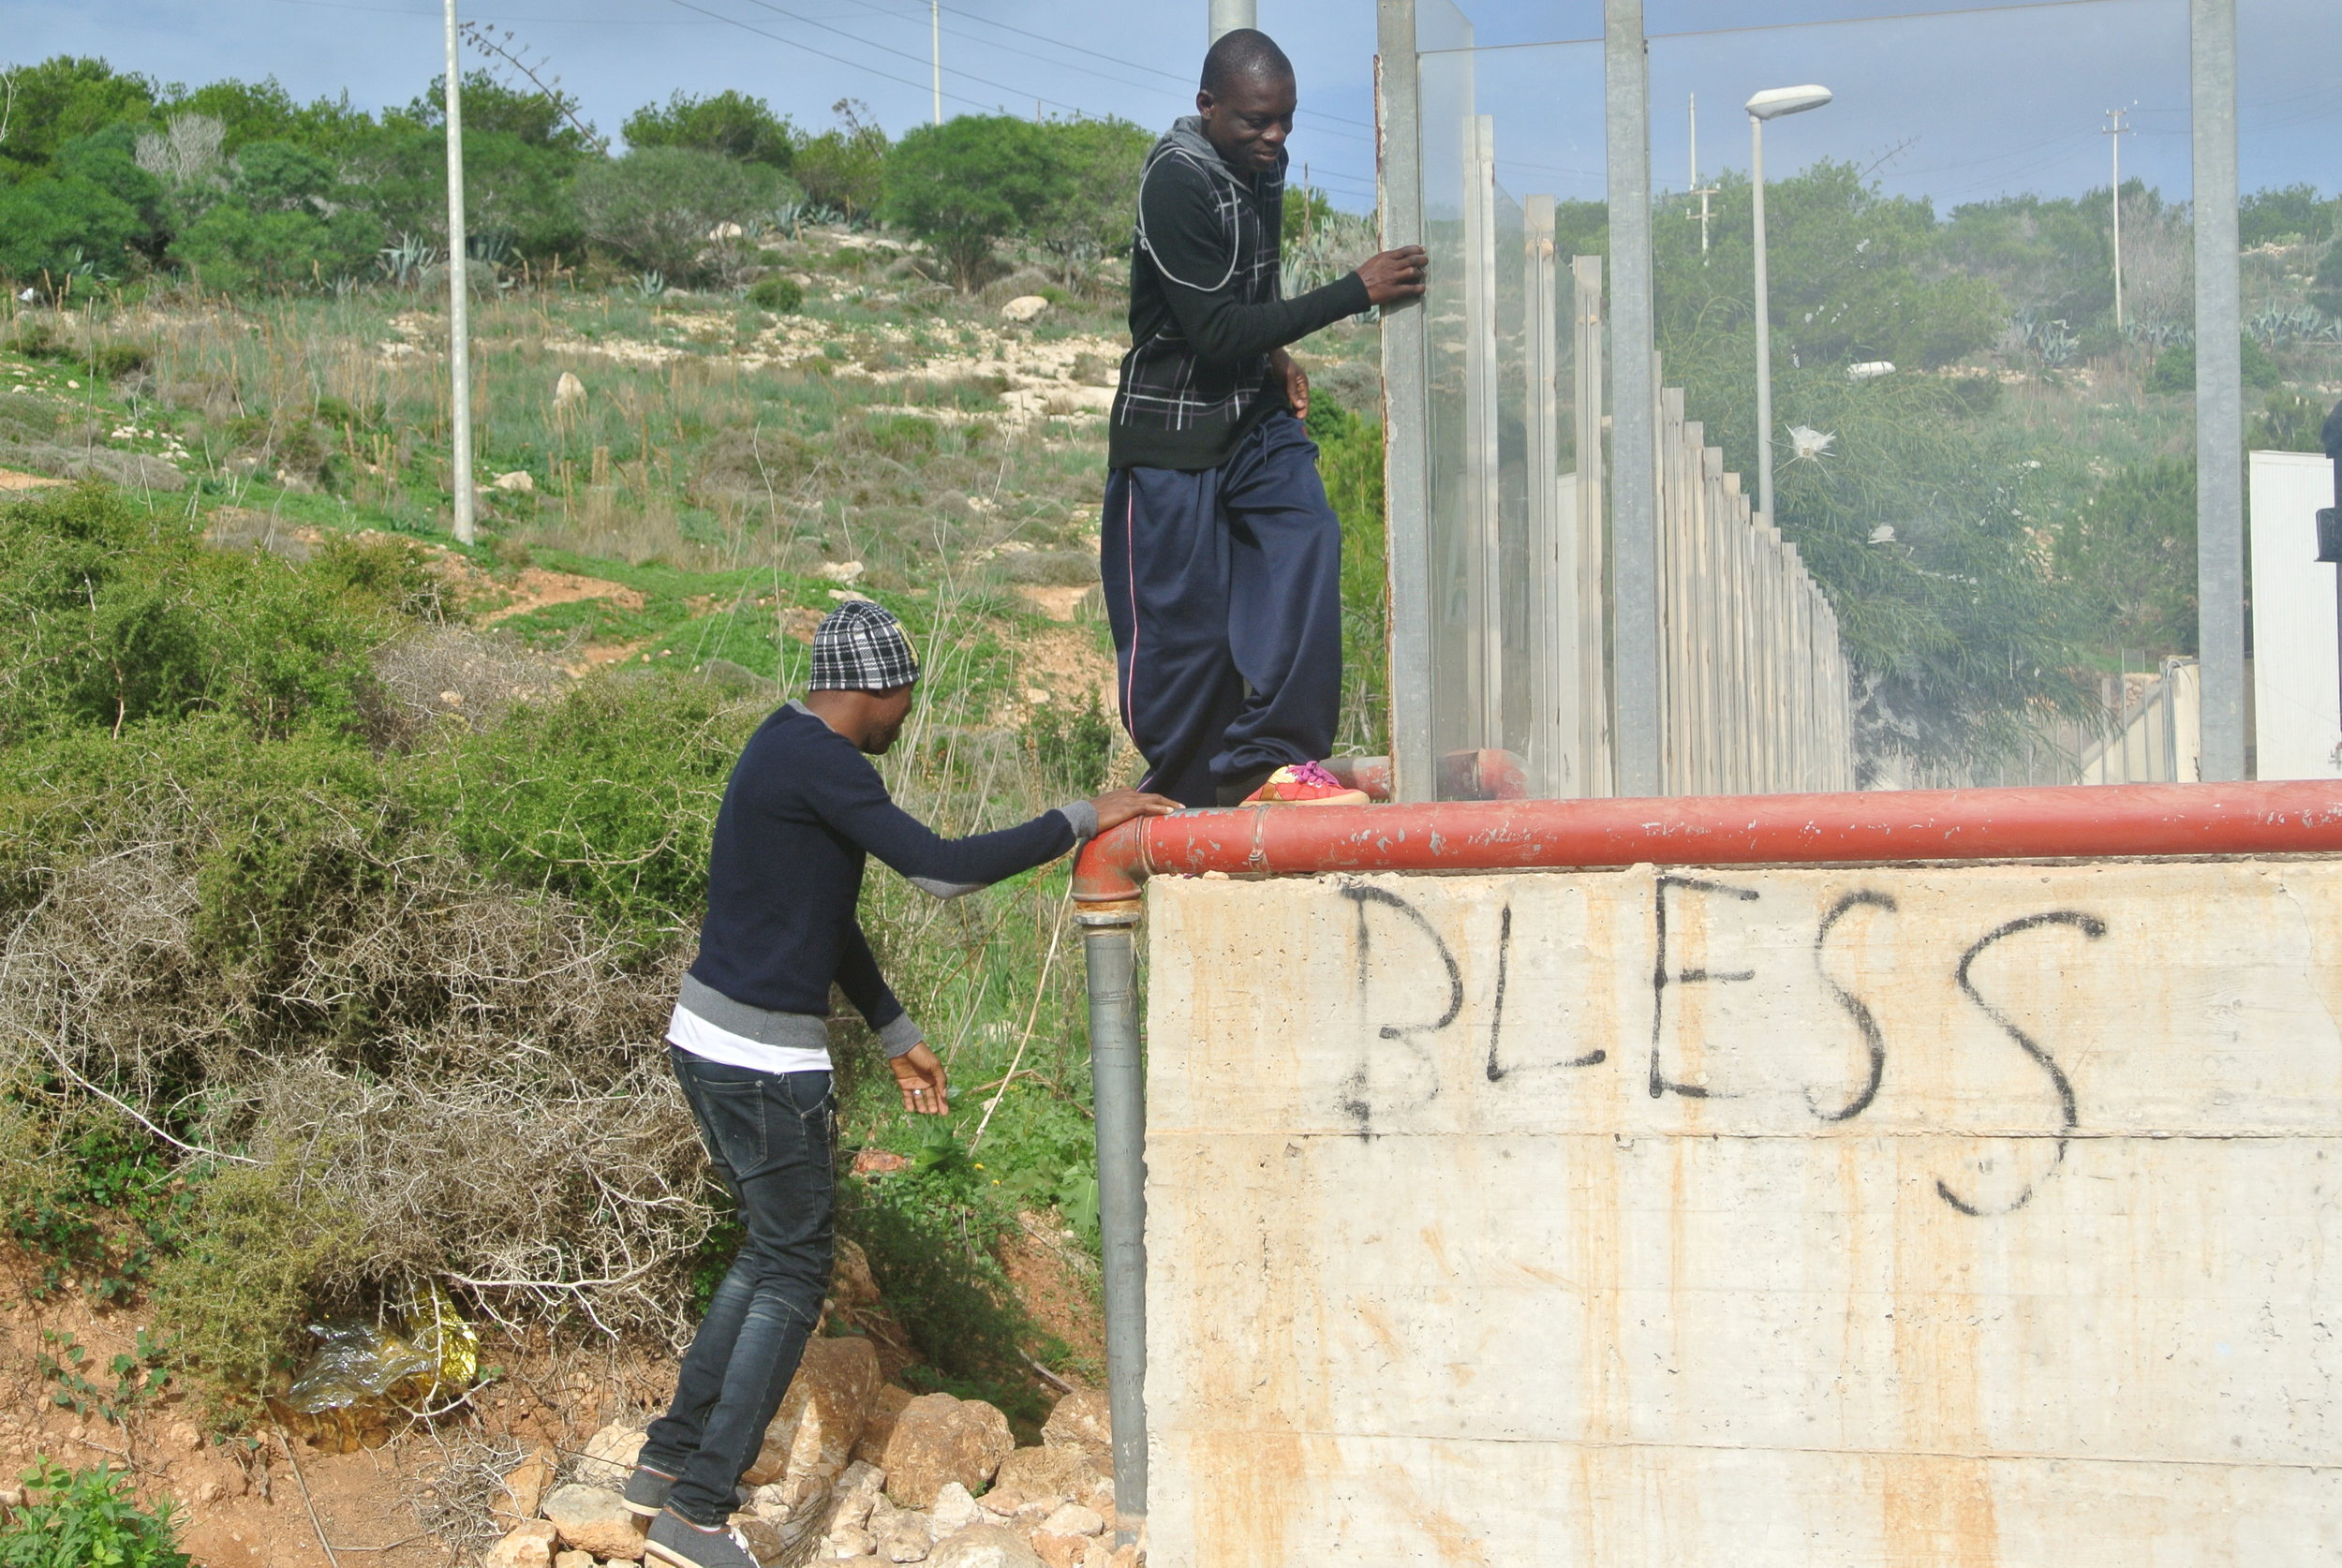 Migrants climb the outer wall to enter the hotspot. Lampedusa, Italy; November 2016. © Pamela Kerpius.